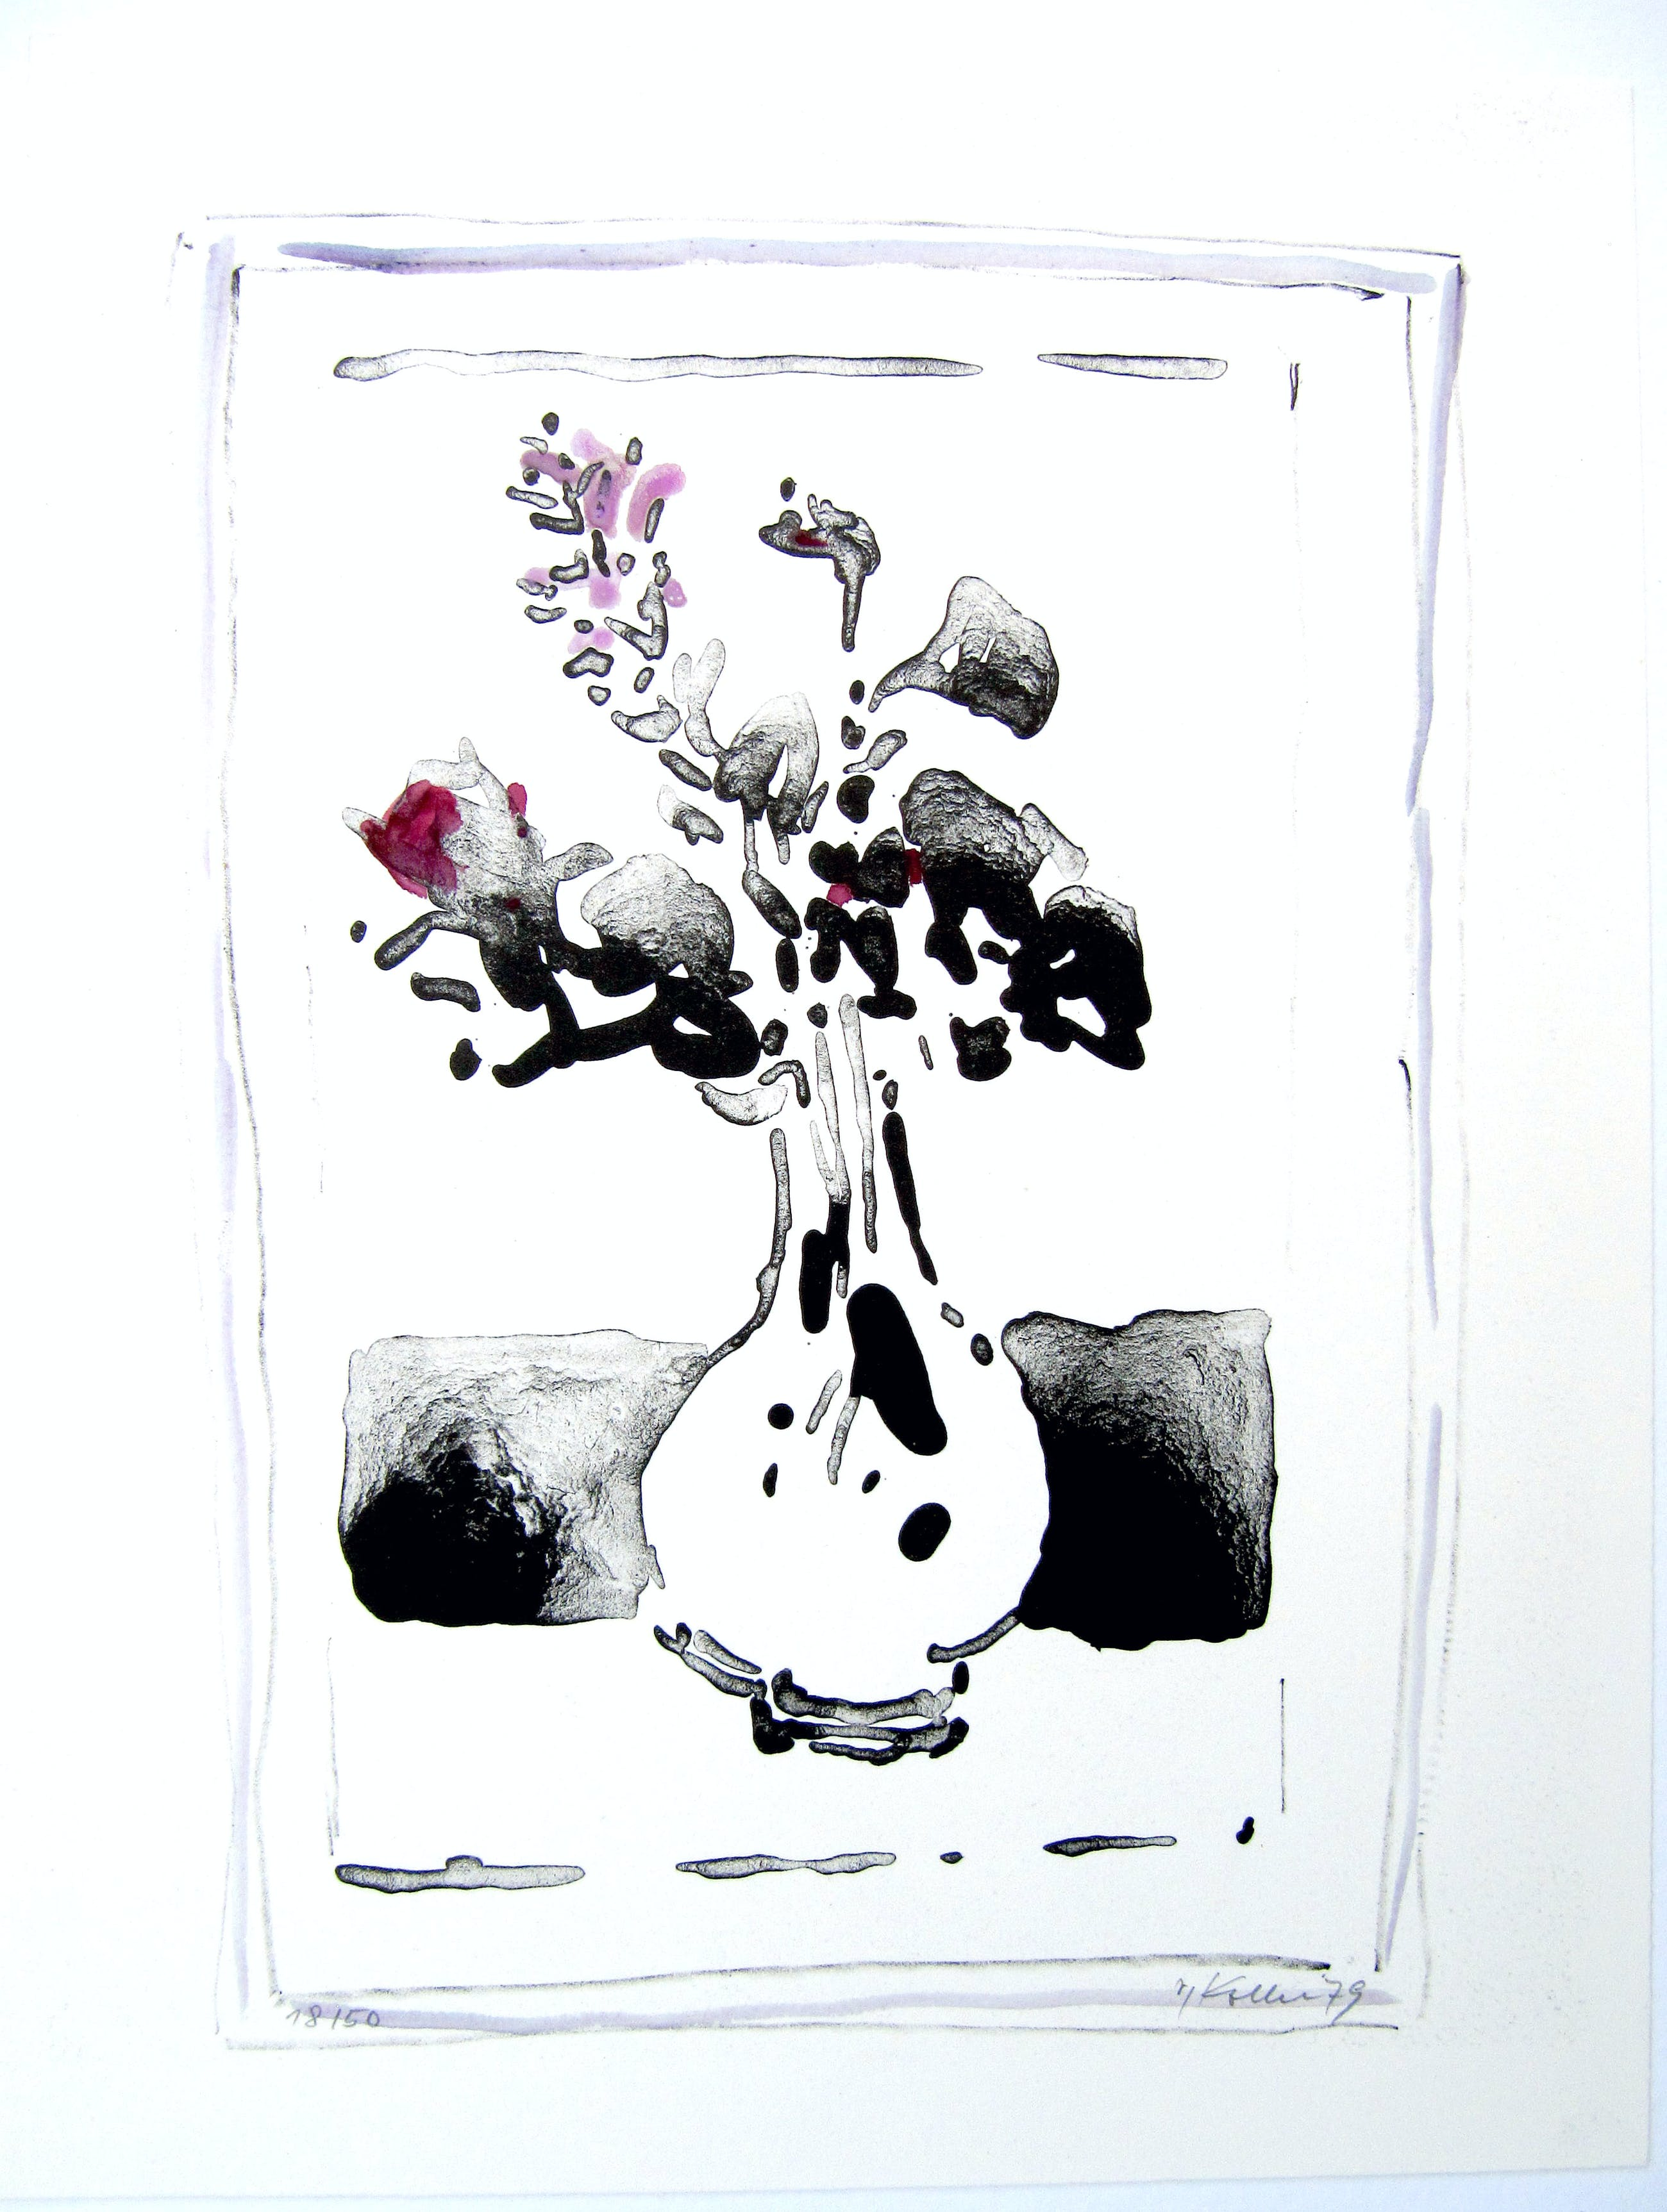 Oskar Koller - Blume mit Rosa Rand WVZ 477 Expl. 18/50 von 1979 kopen? Bied vanaf 190!